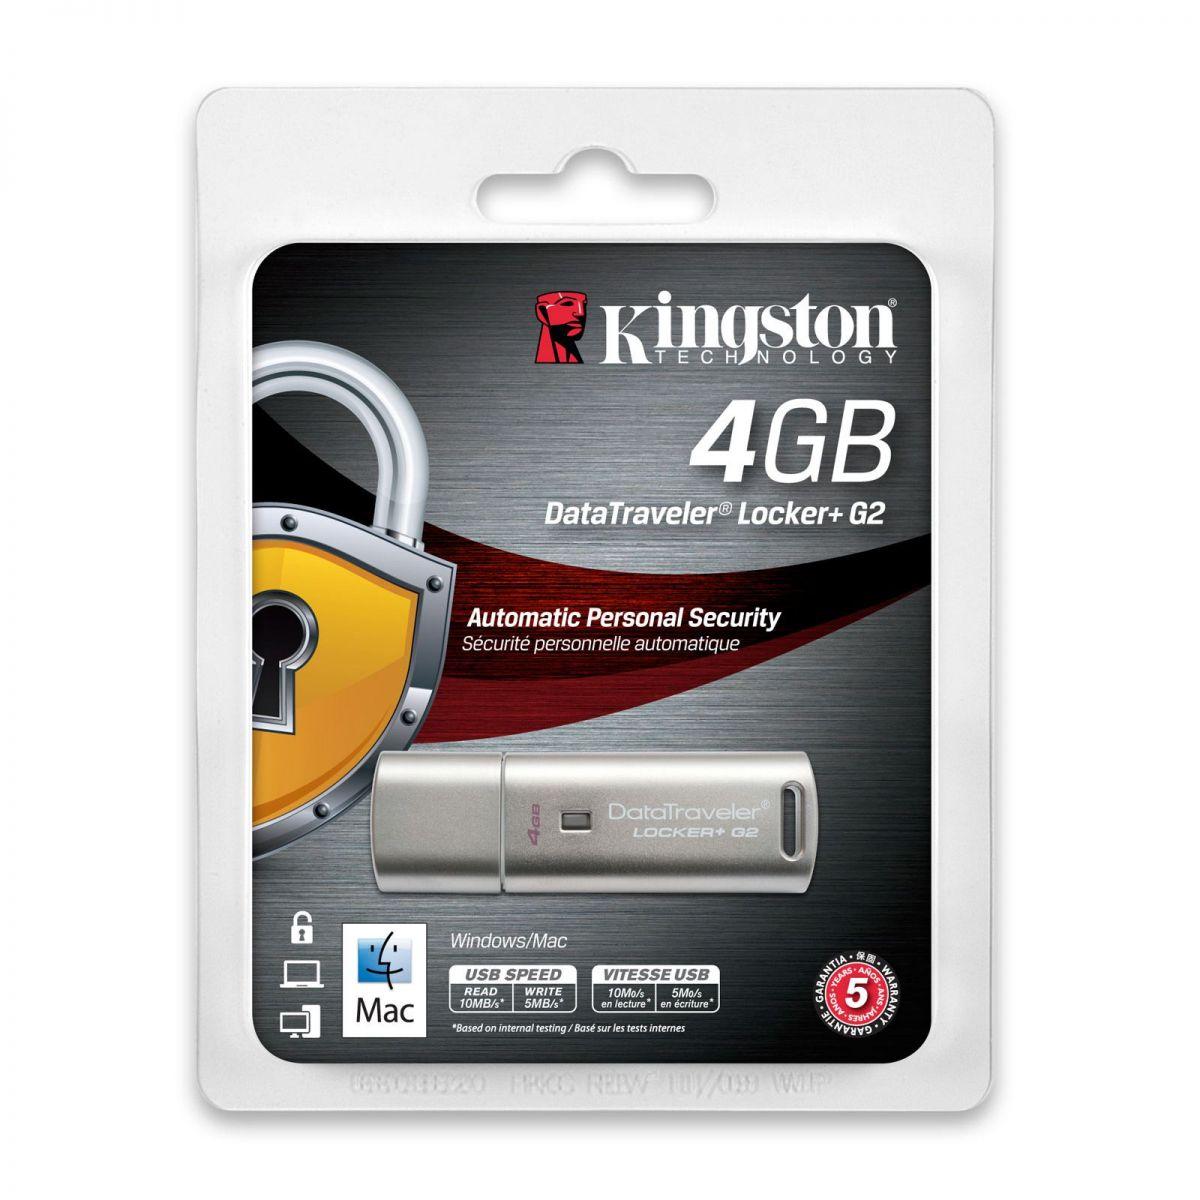 Pen Drive Kingston USB 4GB DataTraveler Locker+ G2 DTLPG2/4GB - Kingston